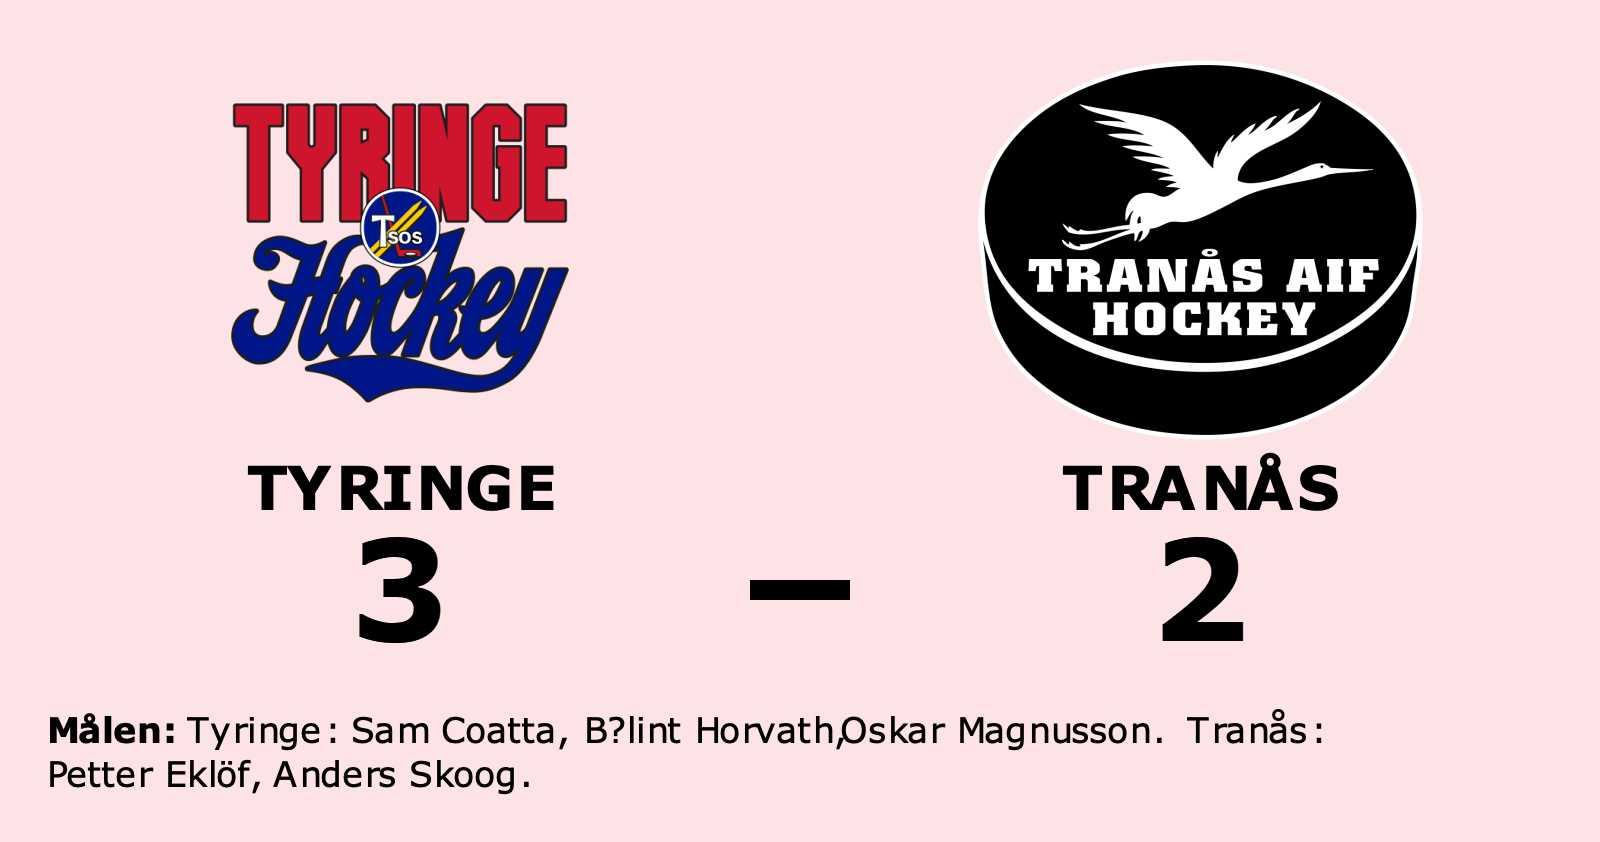 Tyringe vann hemma mot Tranås